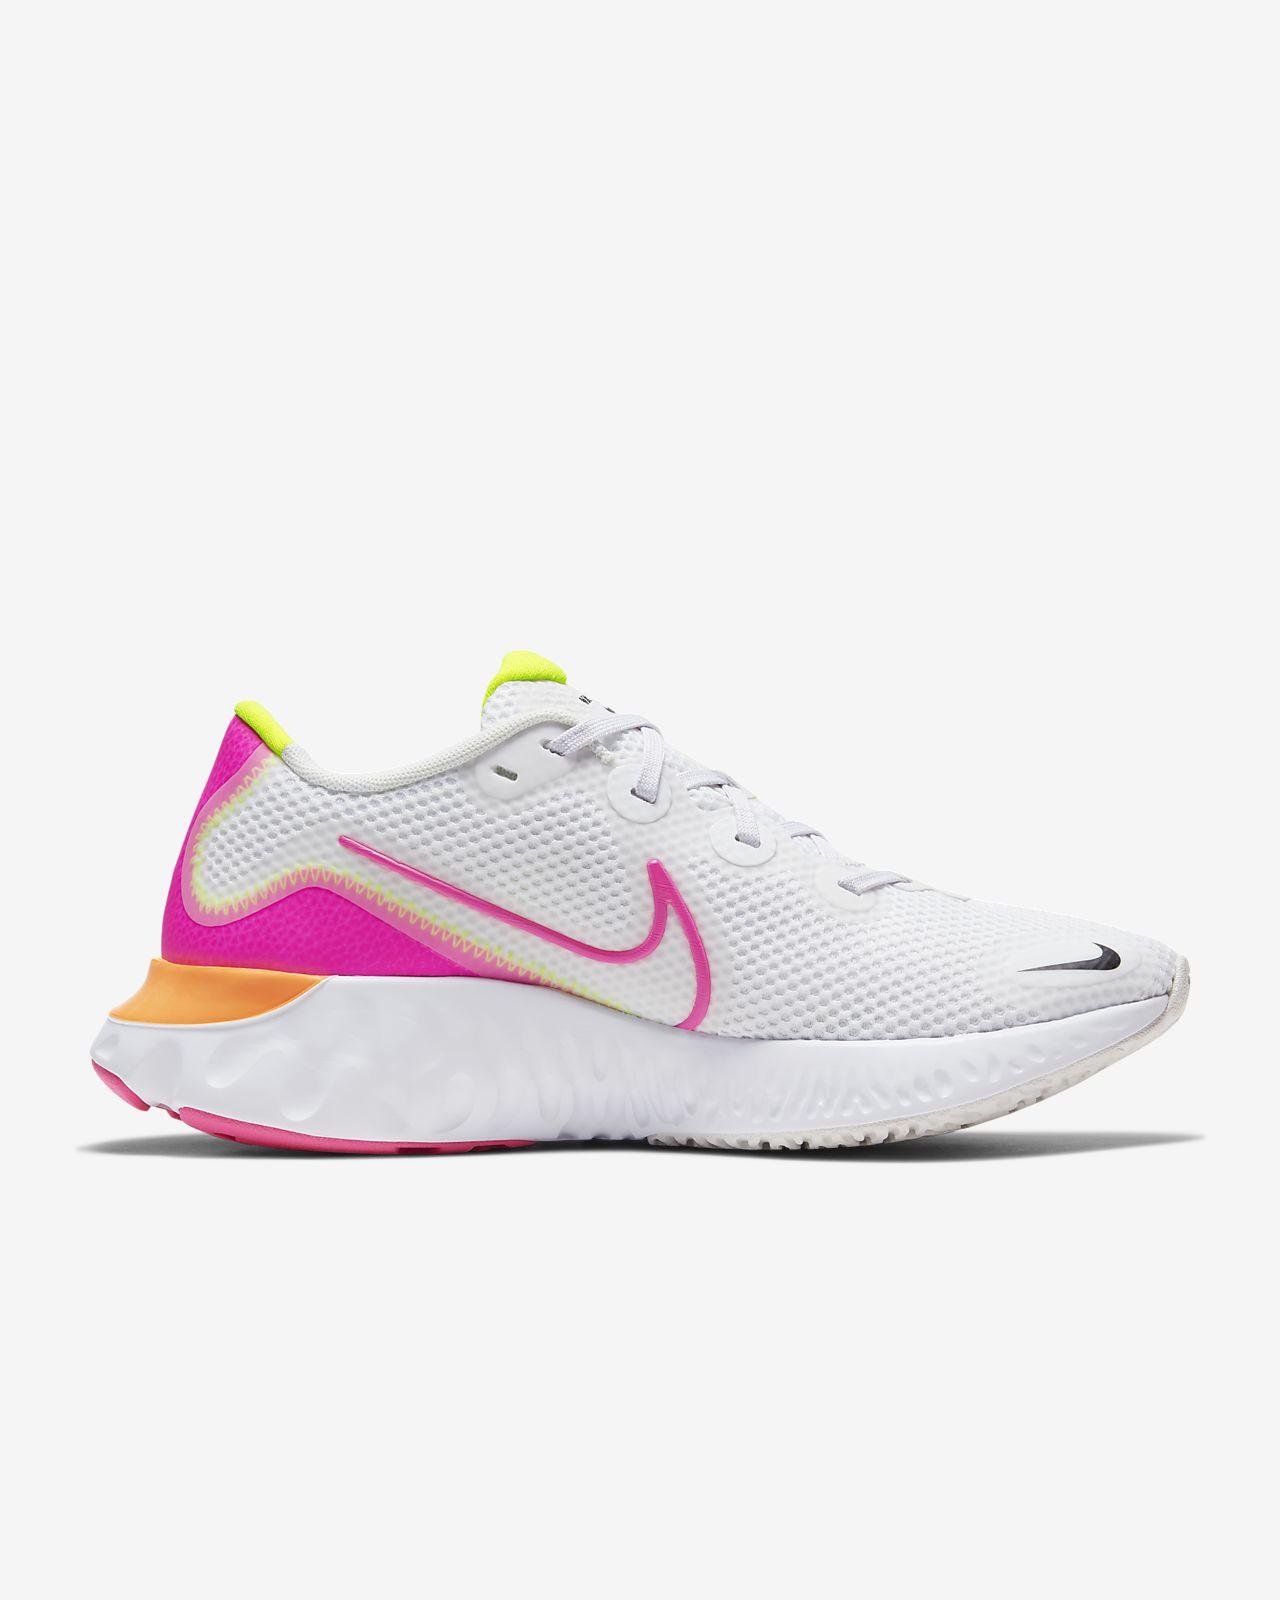 Womens Nike Air Max 270 Shoes 268 SH in 2020